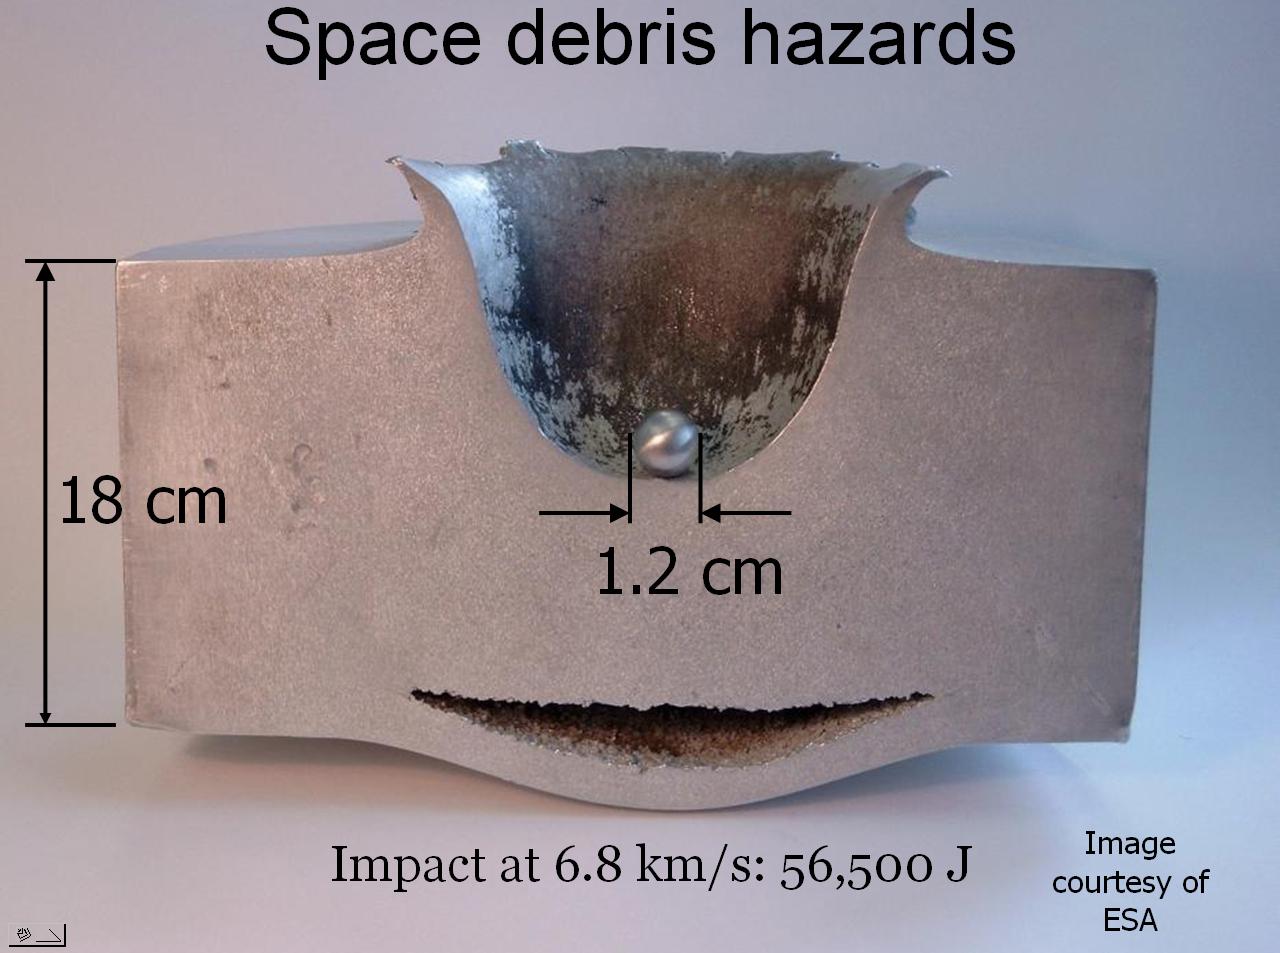 https://www.nasa.gov/images/content/522539main_knipp9-debris.jpg